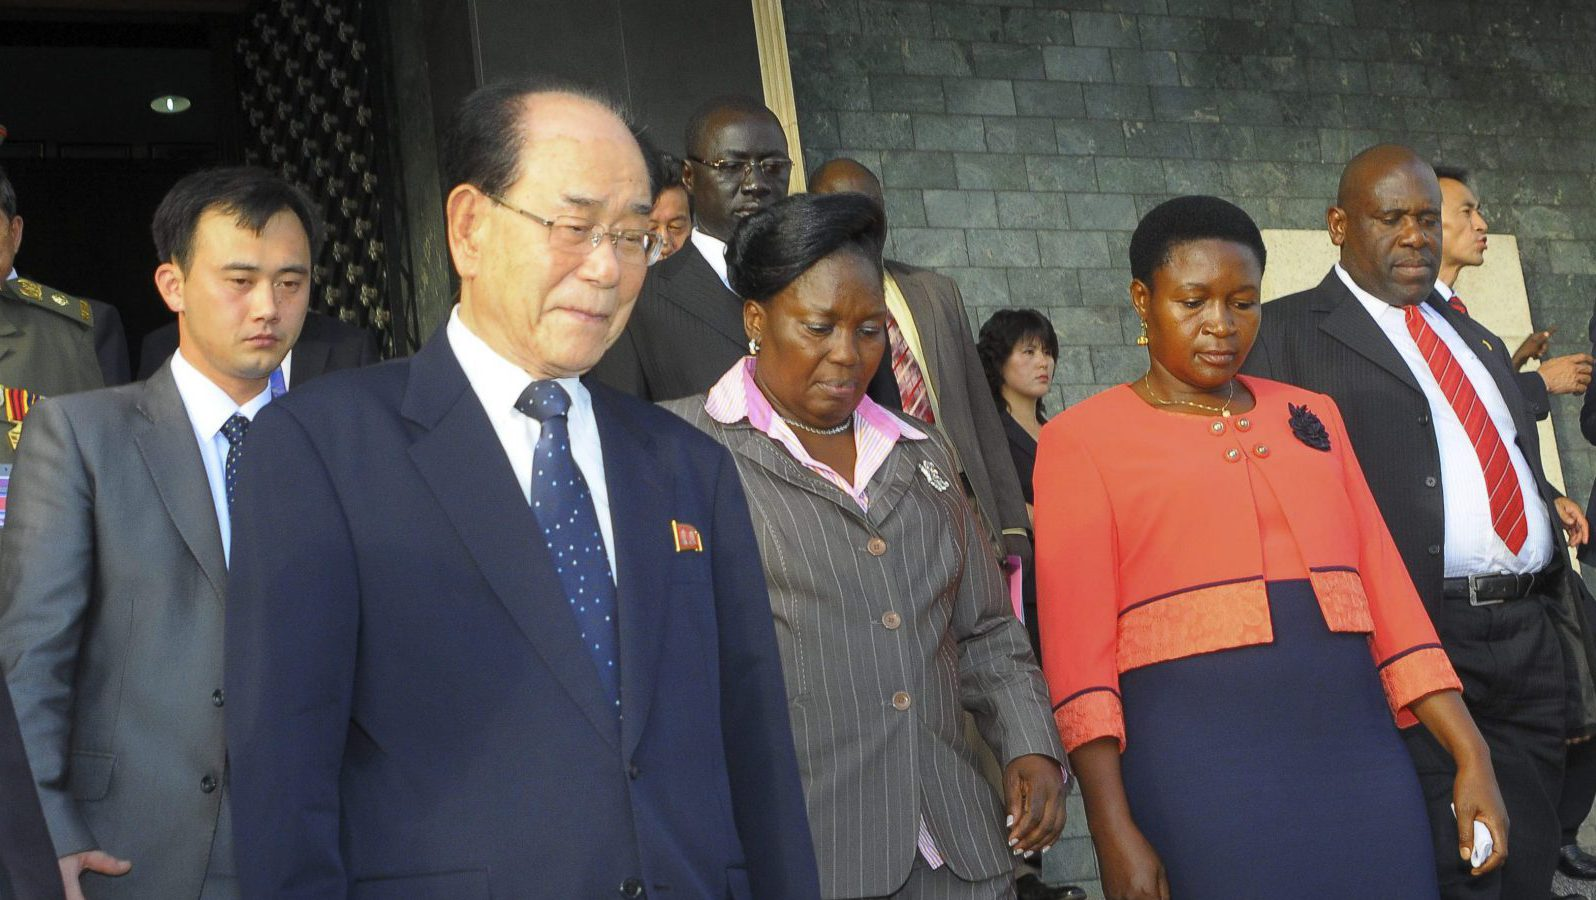 North Korean officials in Uganda